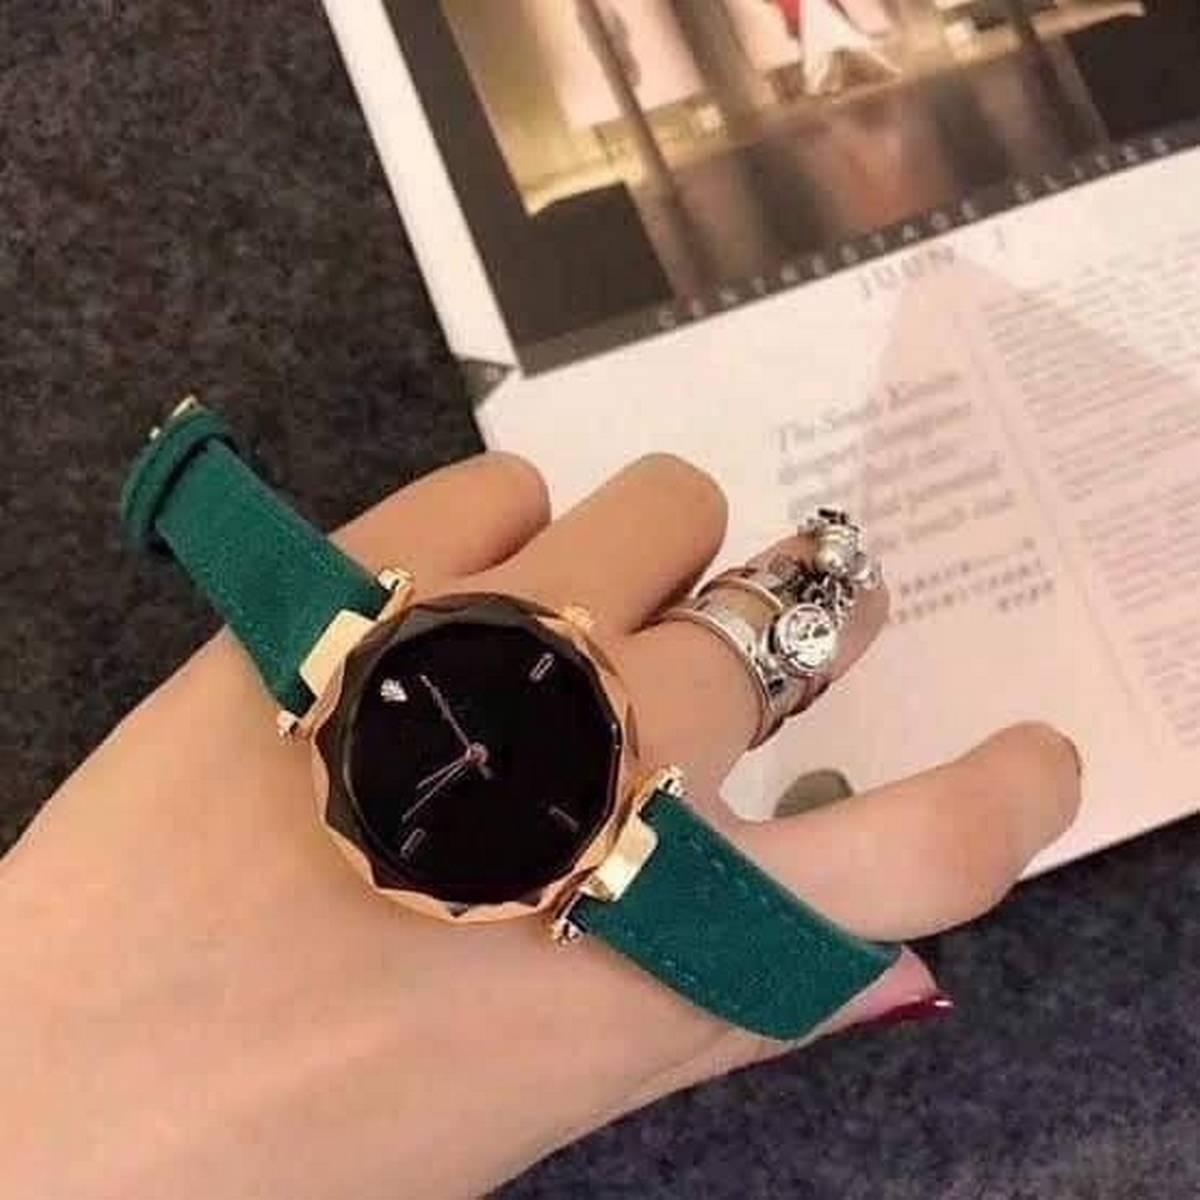 Fashion watch diamond dial leather strip watch